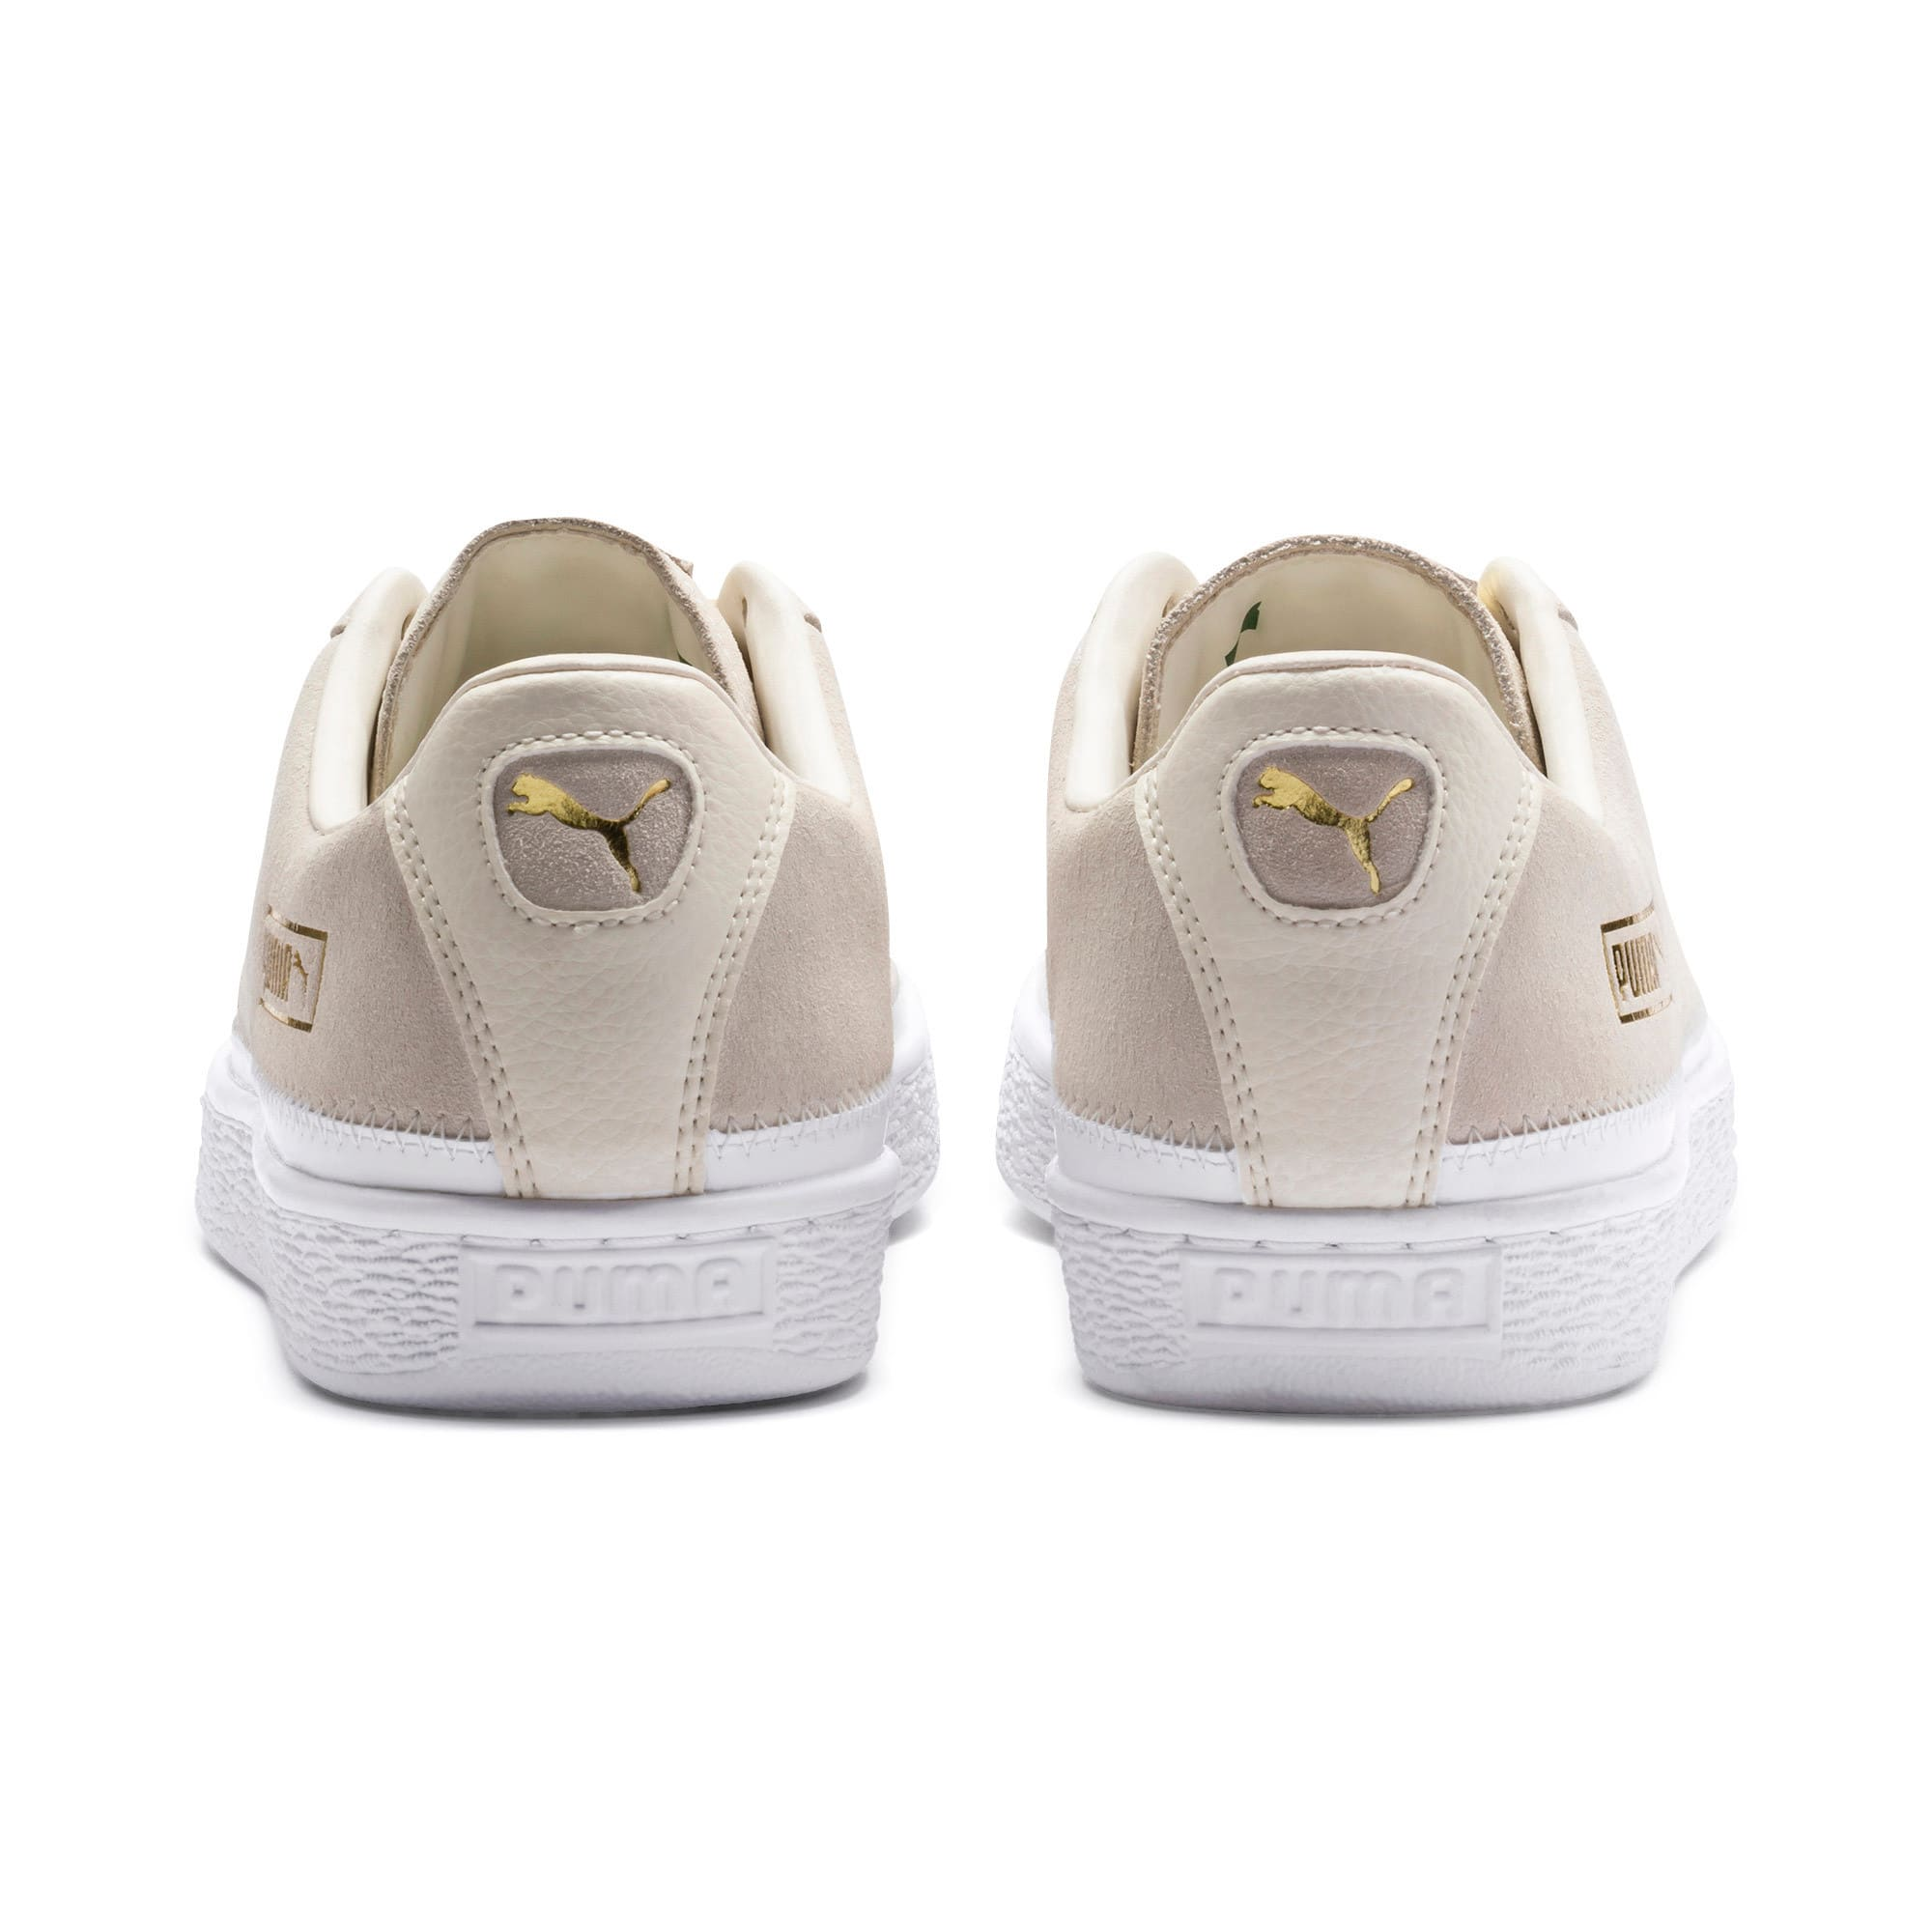 Thumbnail 4 of Suede Trim Sneaker, Whisper White-White- Gold, medium